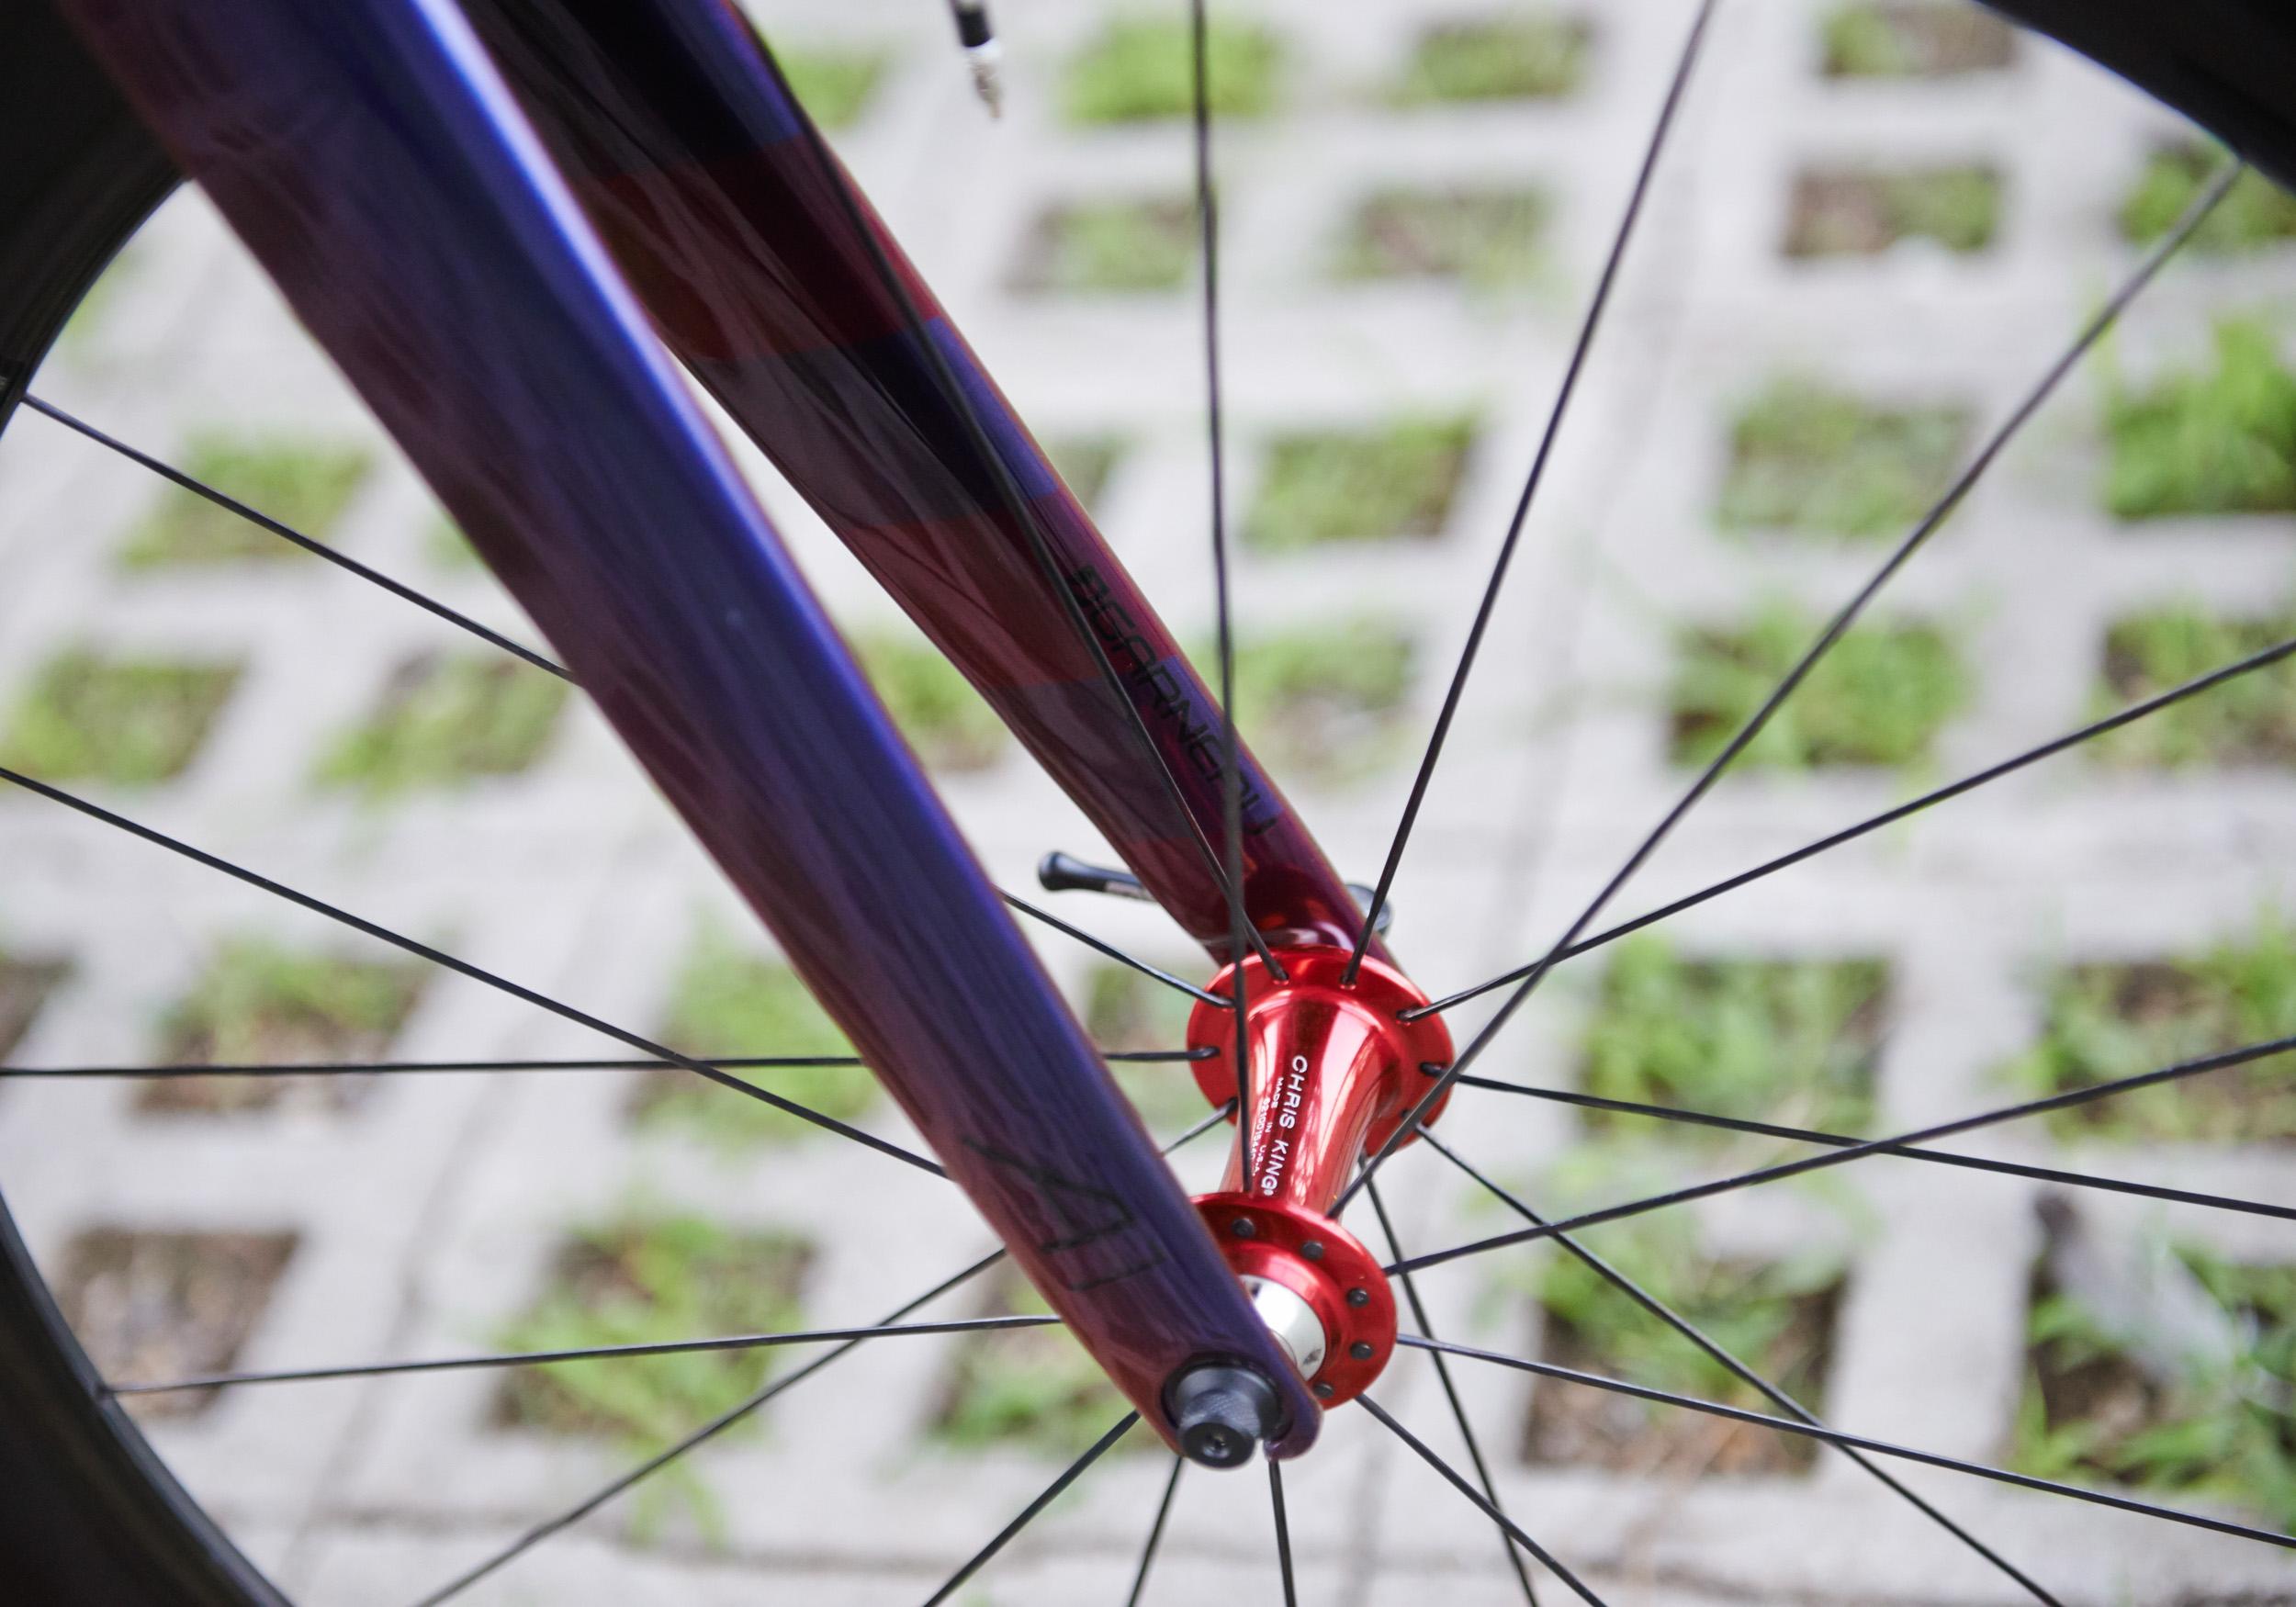 to-be-determined-garneau-a1-bike-review-127.jpg